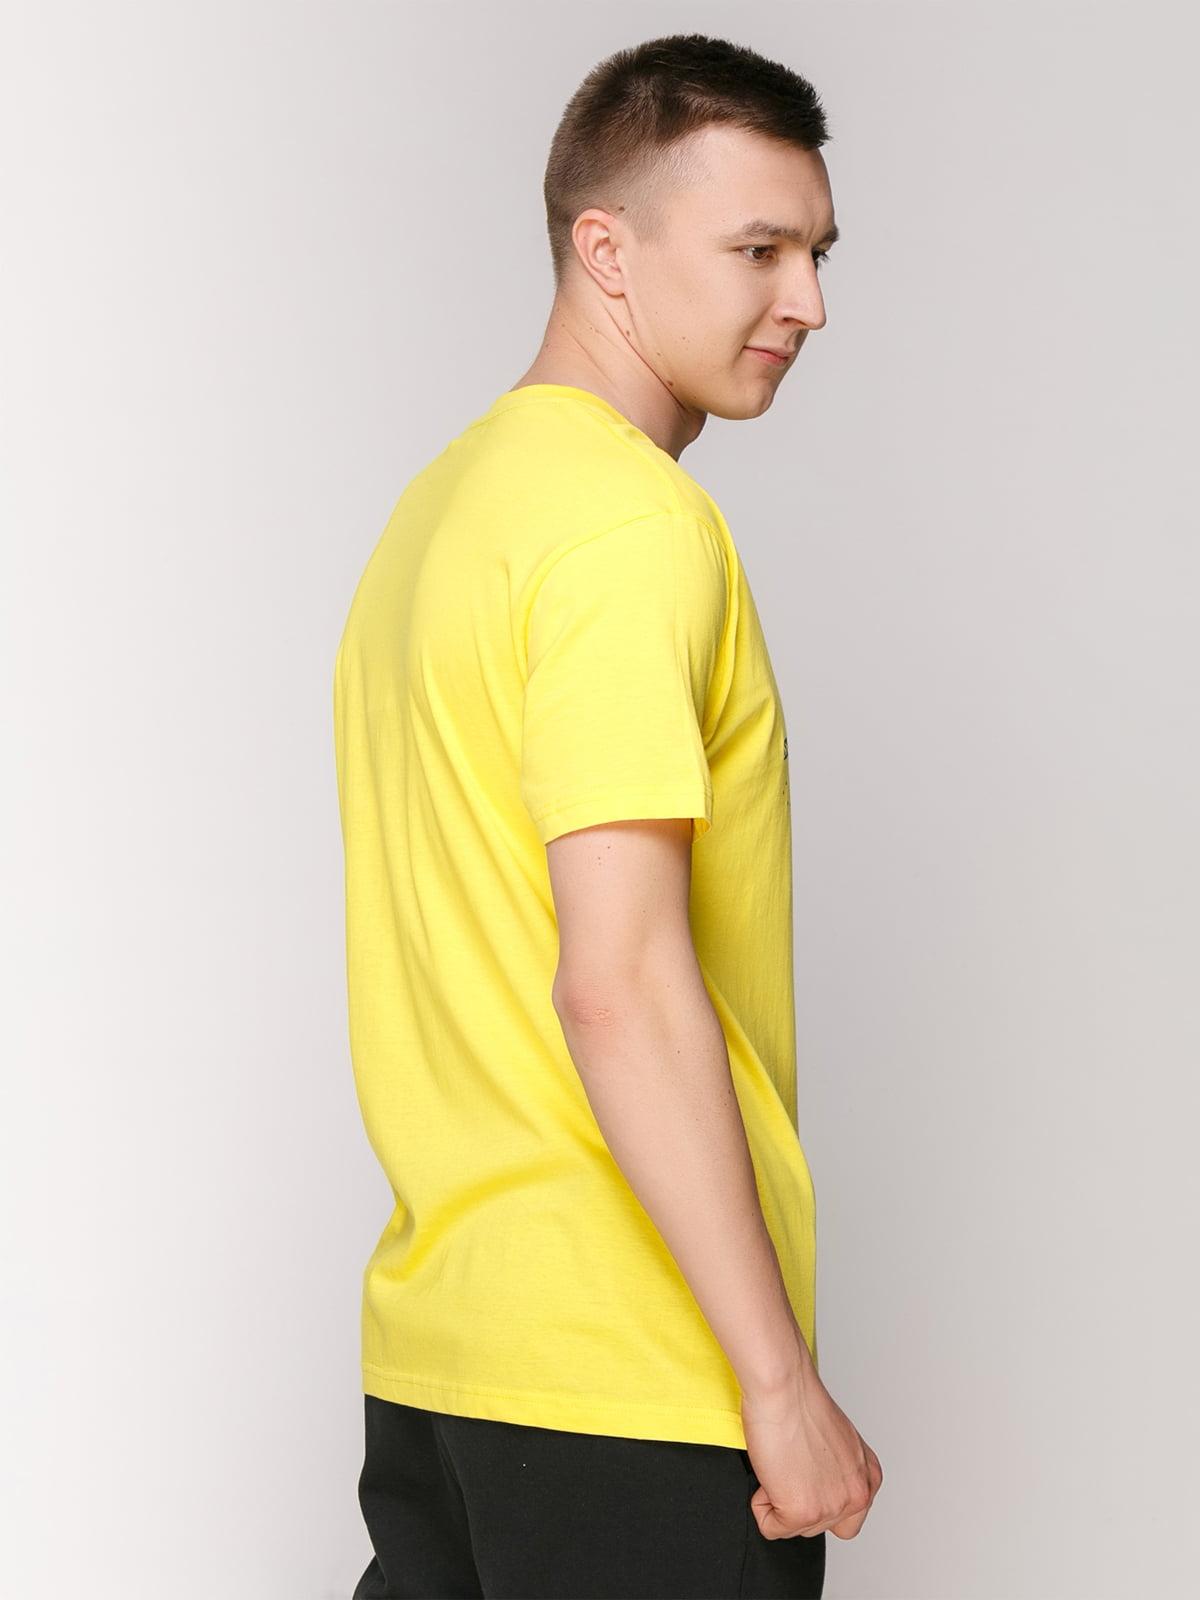 Футболка жовта з принтом | 4495526 | фото 2